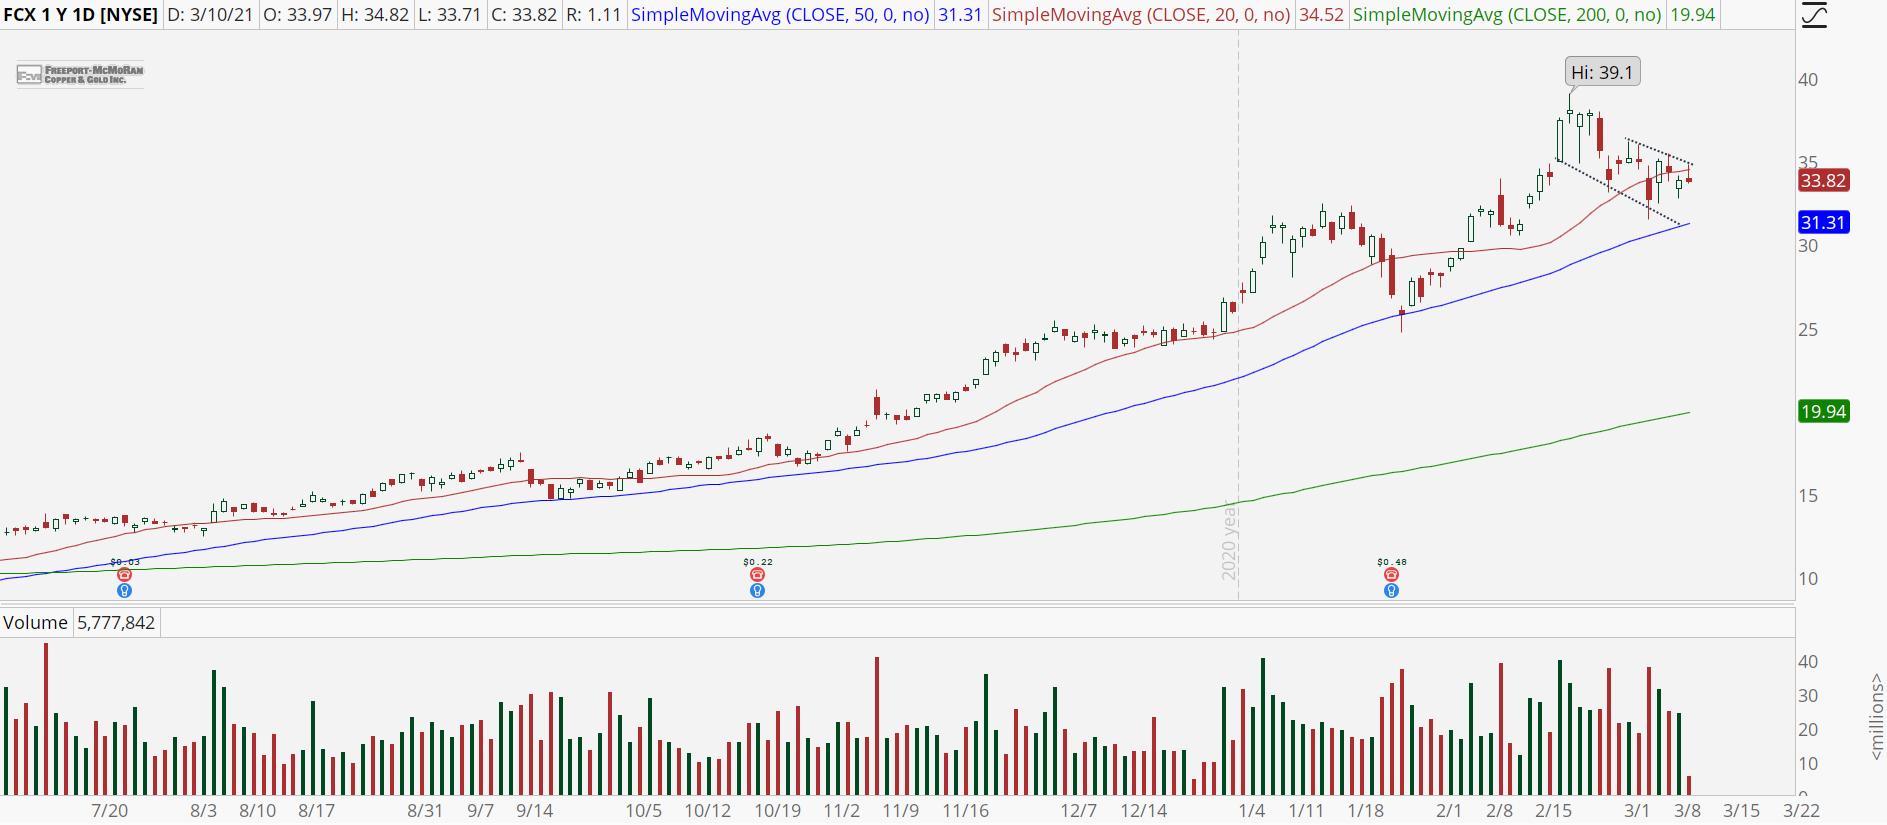 Freeport-McMoran (FCX) stock with bull retracement